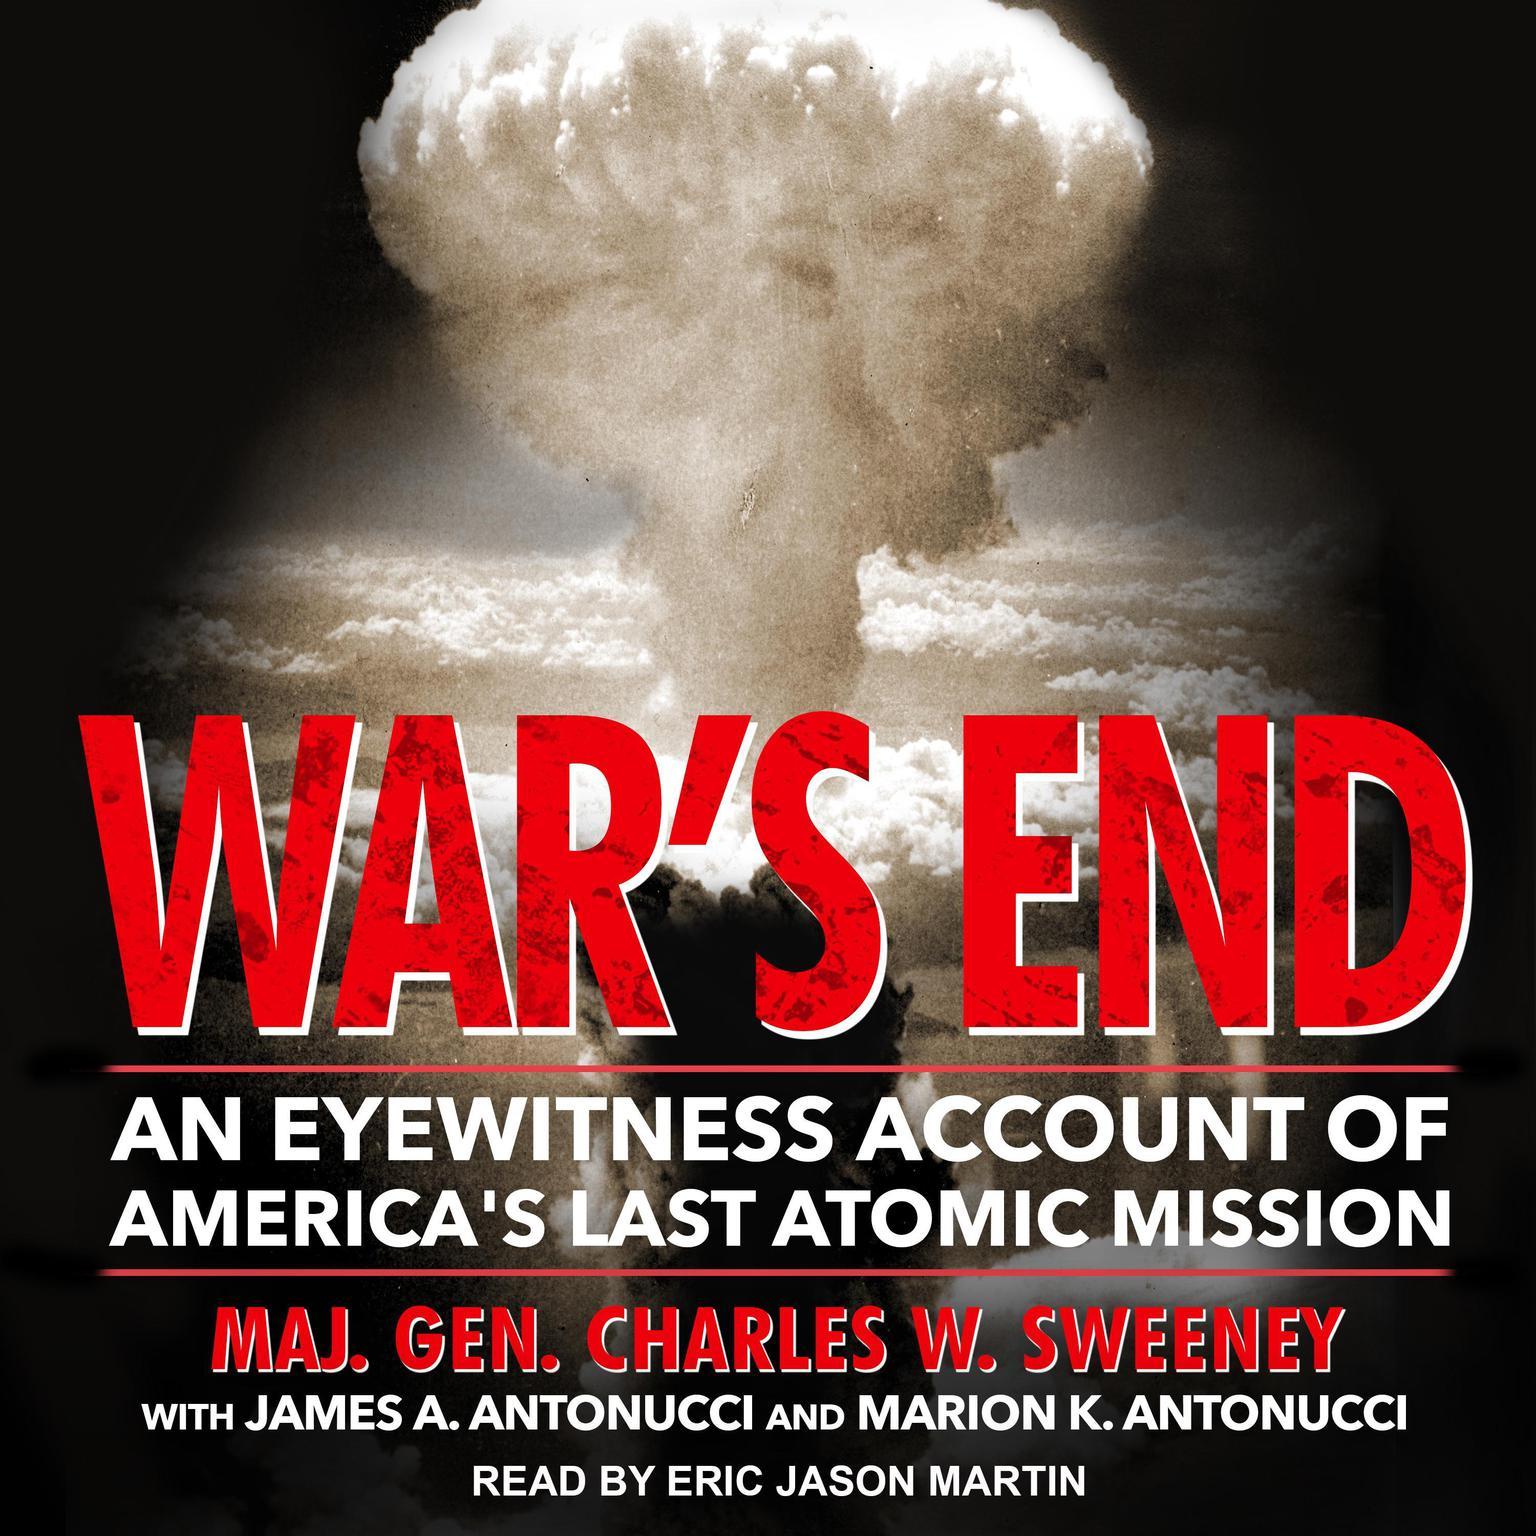 Wars End: An Eyewitness Account of Americas Last Atomic Mission Audiobook, by Maj. Gen. Charles W. Sweeney